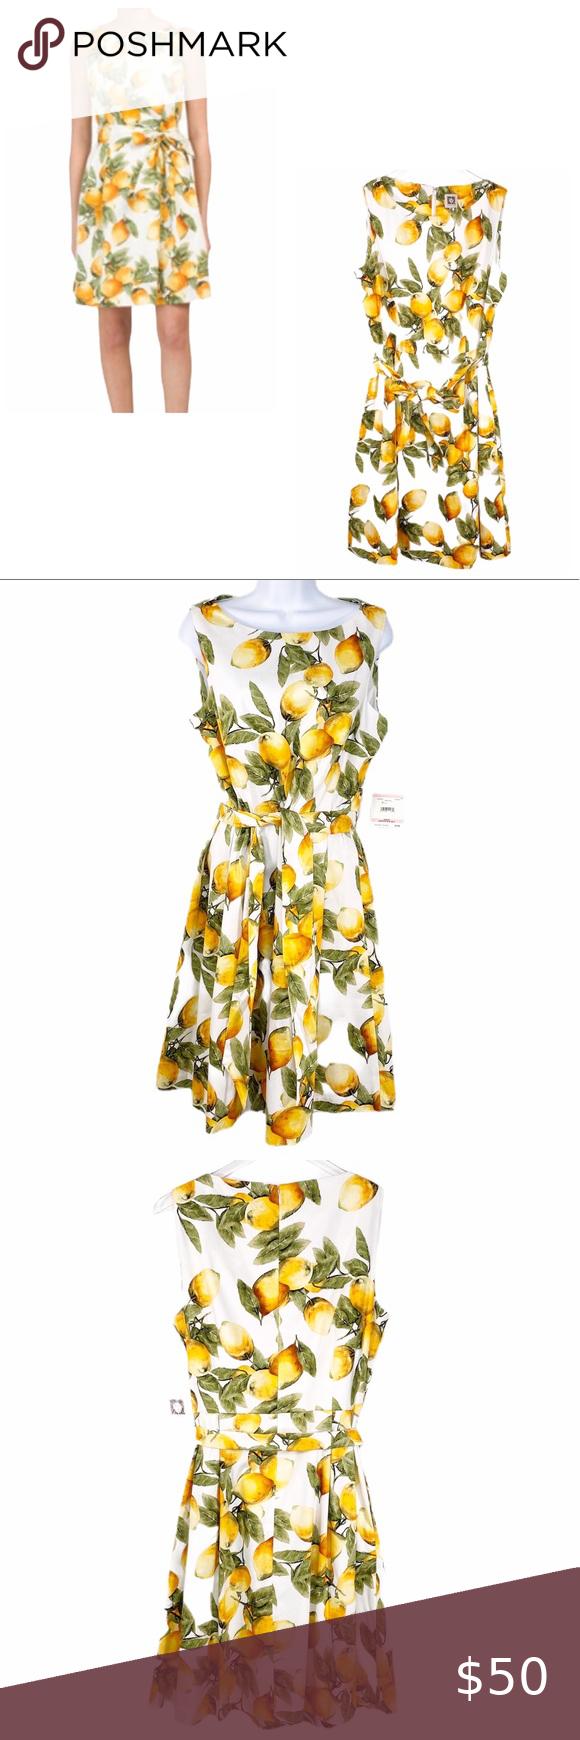 Anne Klein White Yellow Lemon Sleeveless Dress Nwt In 2021 Wrap Dress Pattern Combo Dress Color Block Shift Dress [ 1740 x 580 Pixel ]